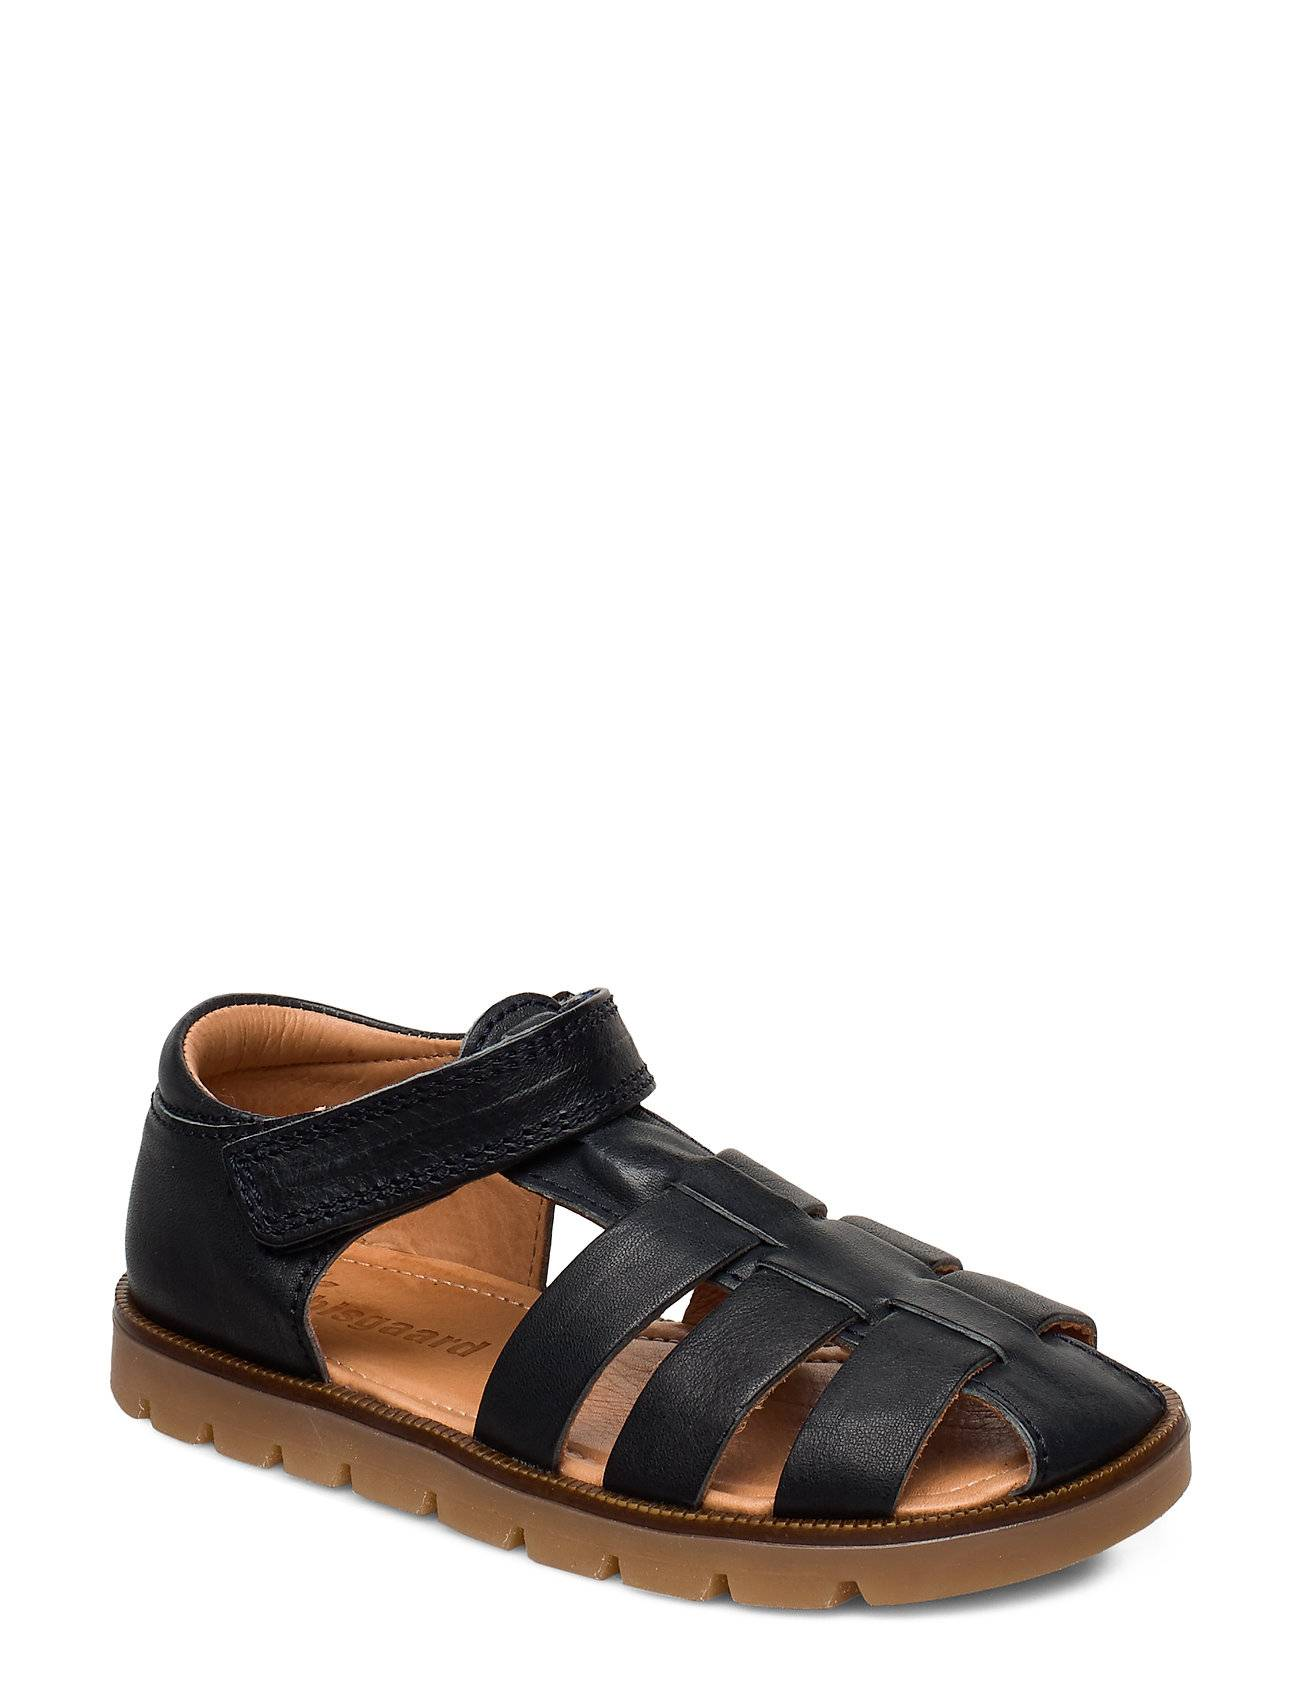 Bisgaard Beka Shoes Summer Shoes Sandals Sininen Bisgaard